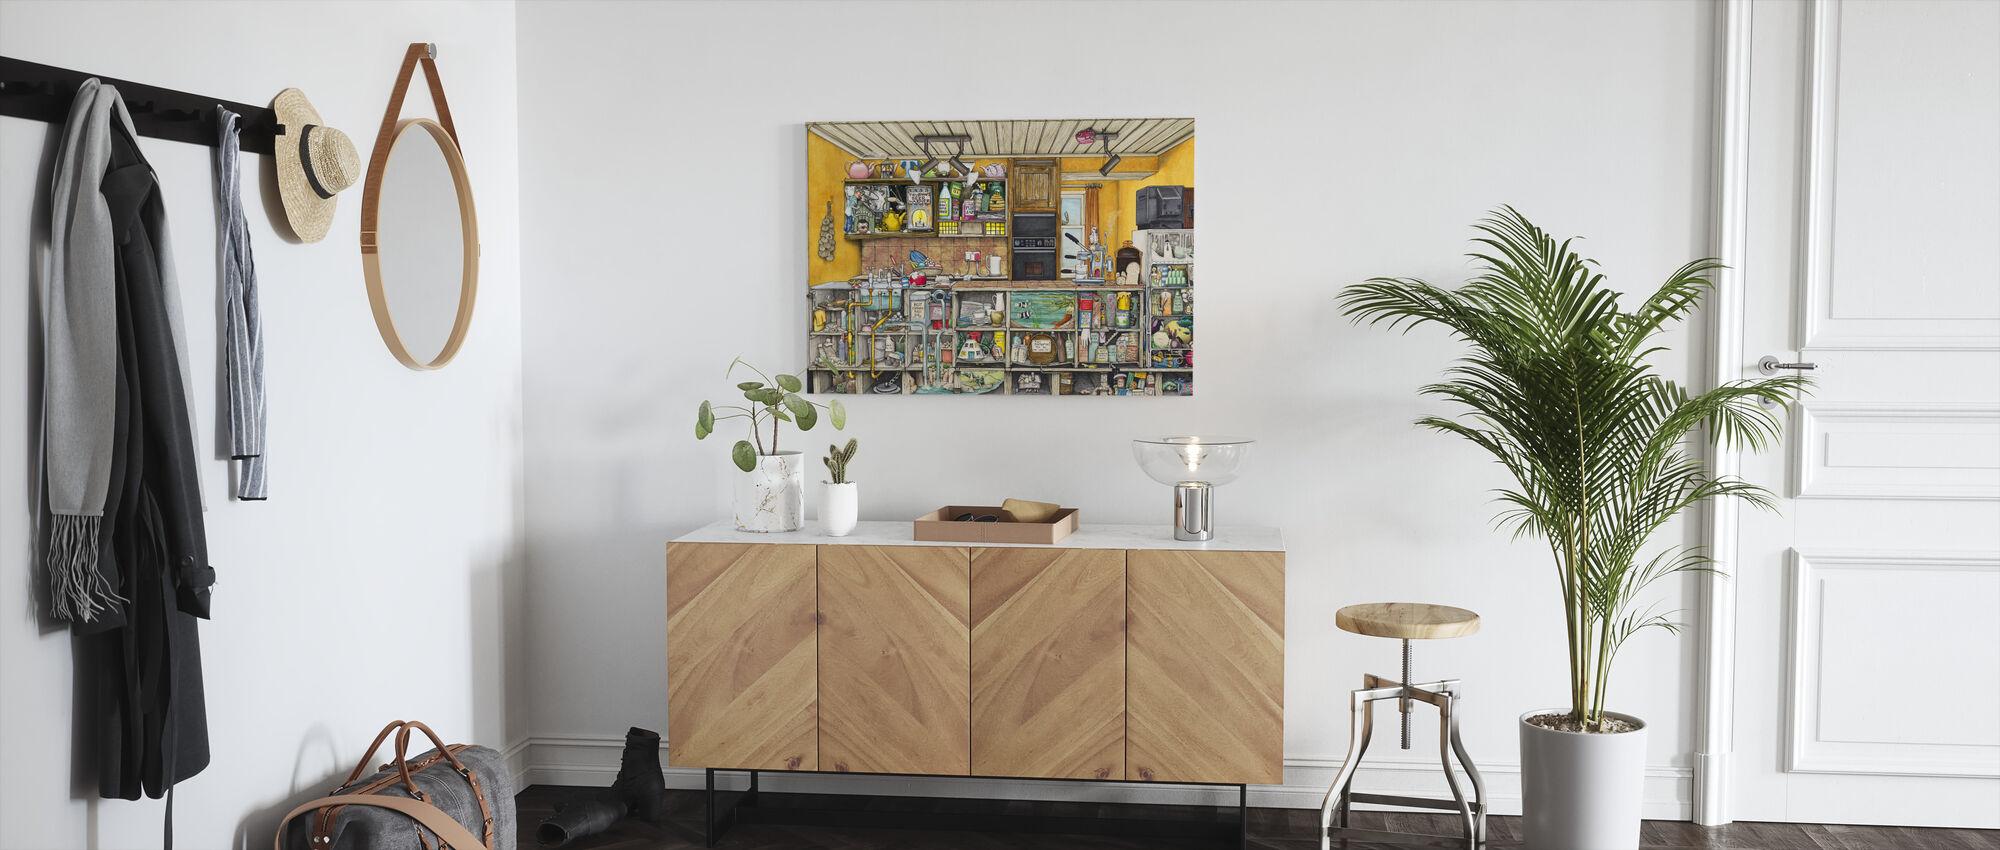 Keittiö - Canvastaulu - Aula